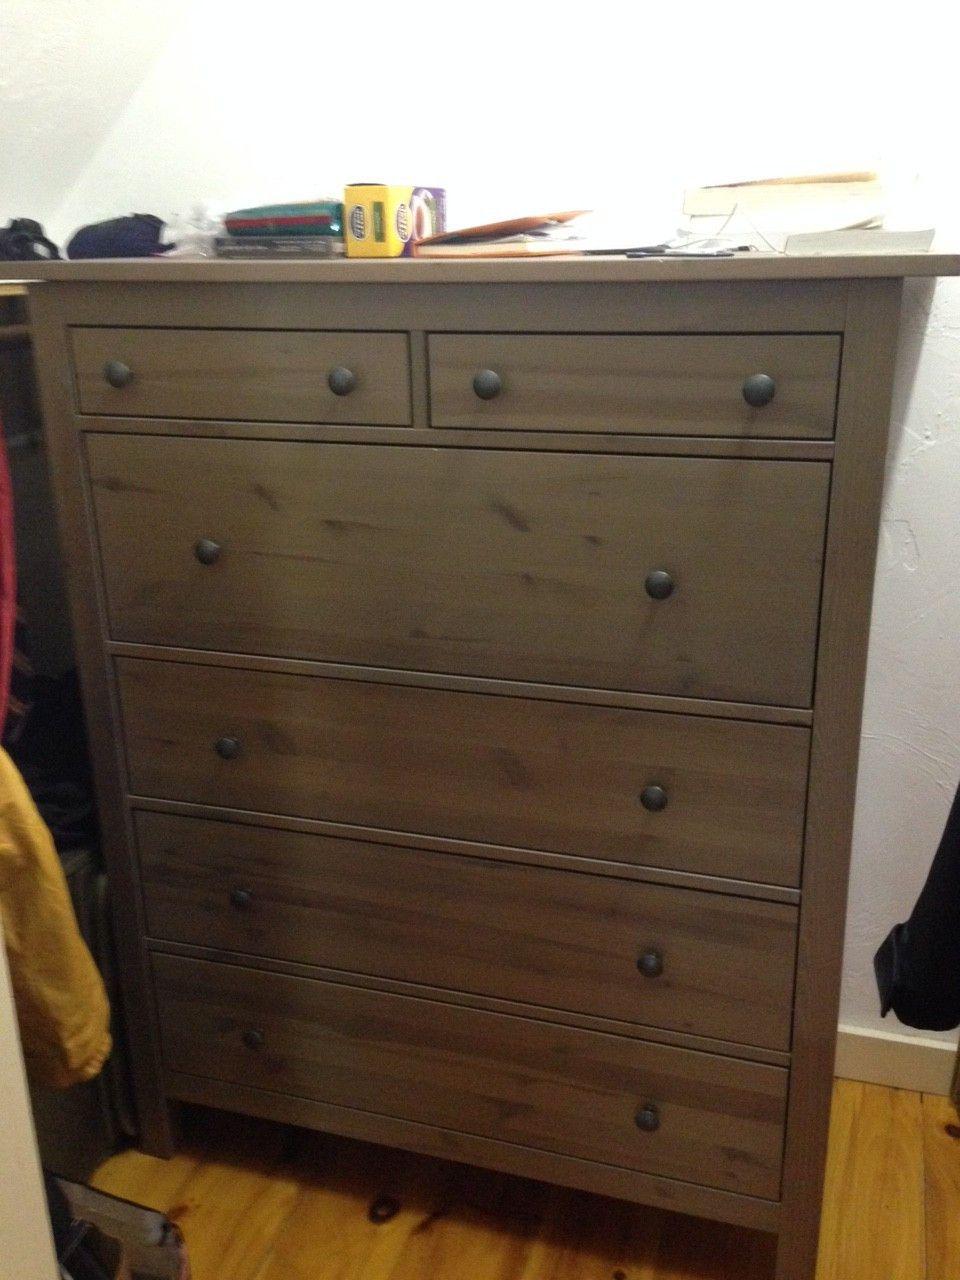 Ikea Hemnes Dresser For Sale Interior Design Ideas Bedroom Check More At Http